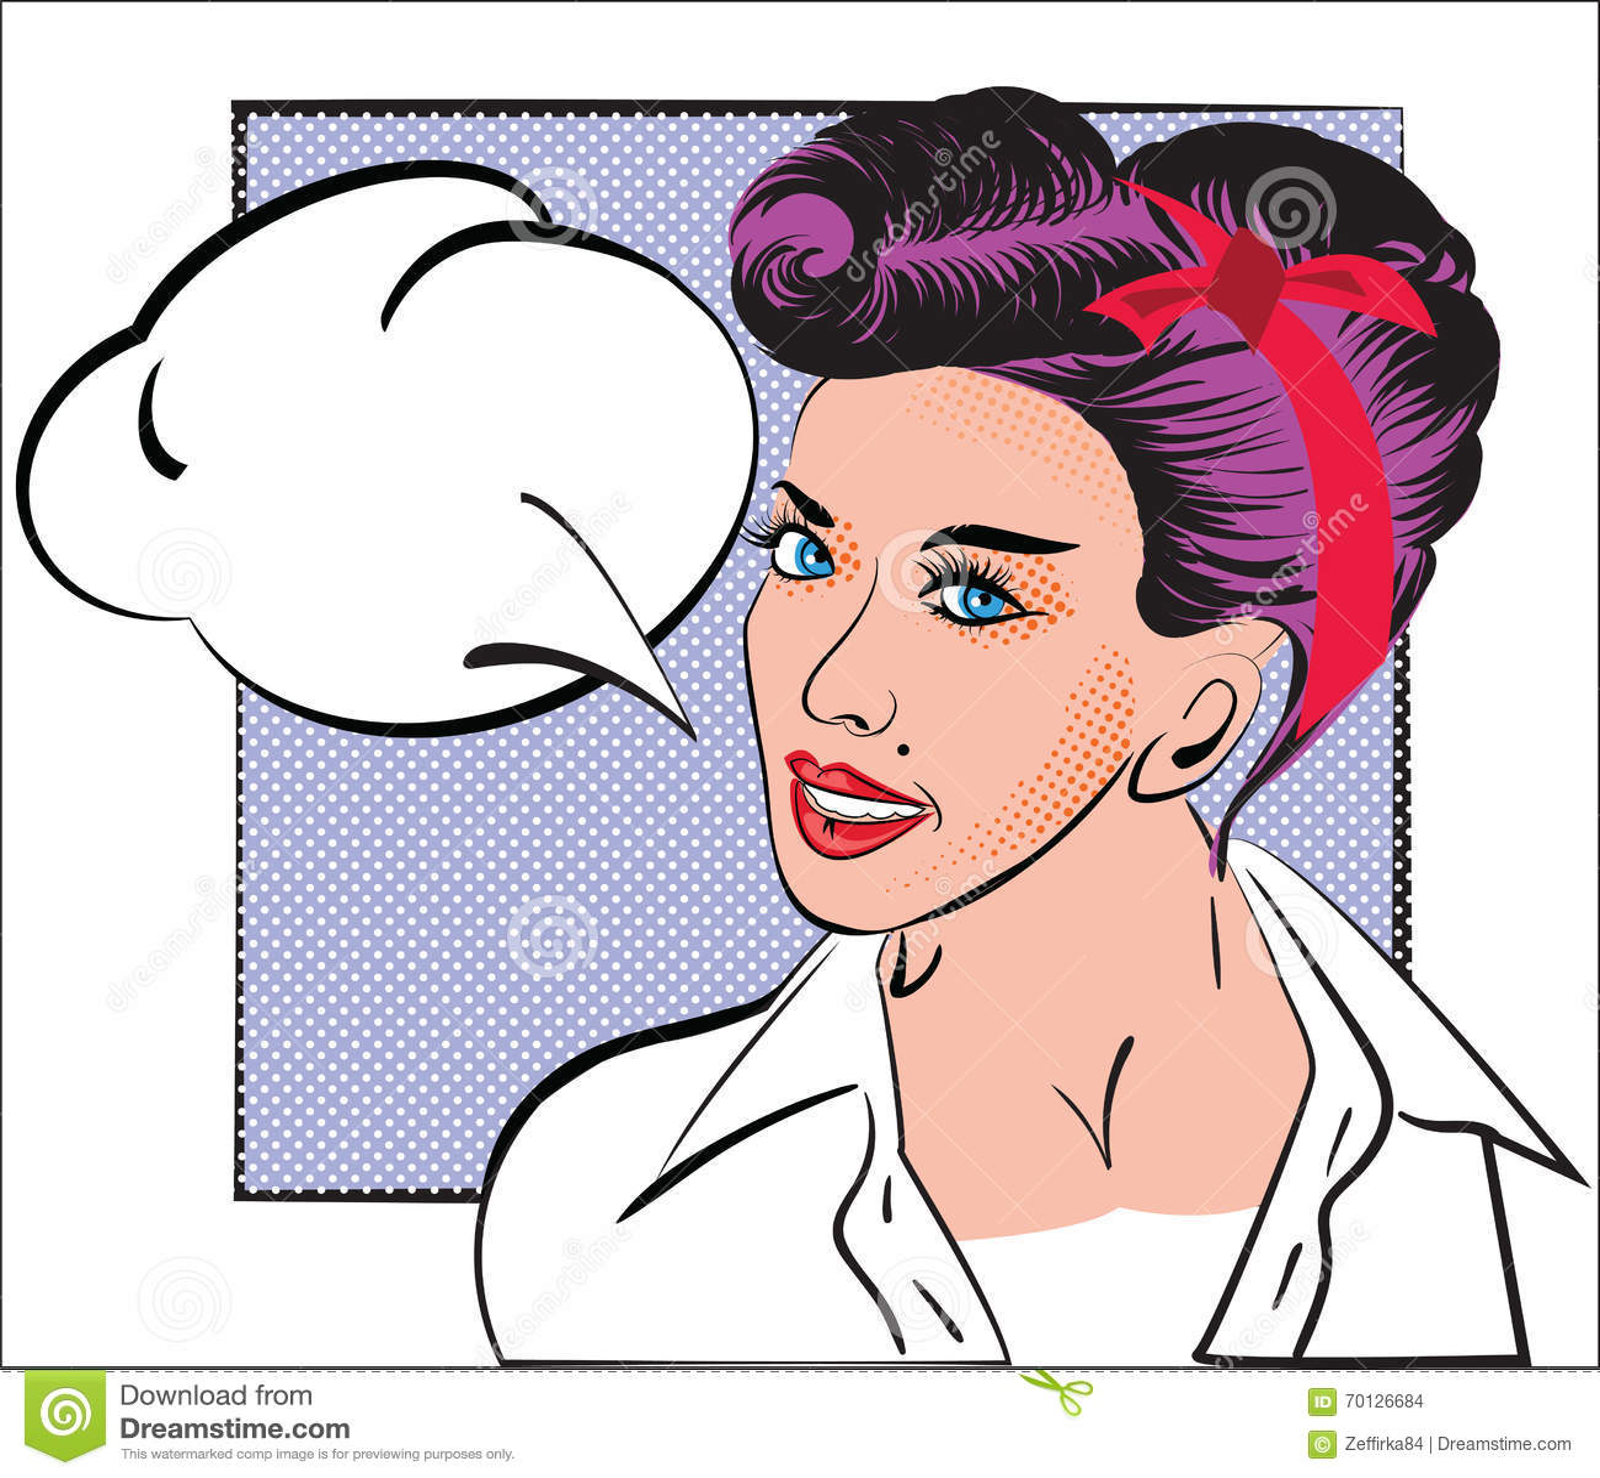 Portrat Des Madchens In Der Artpop Art Comic Bucher Skizze Frau